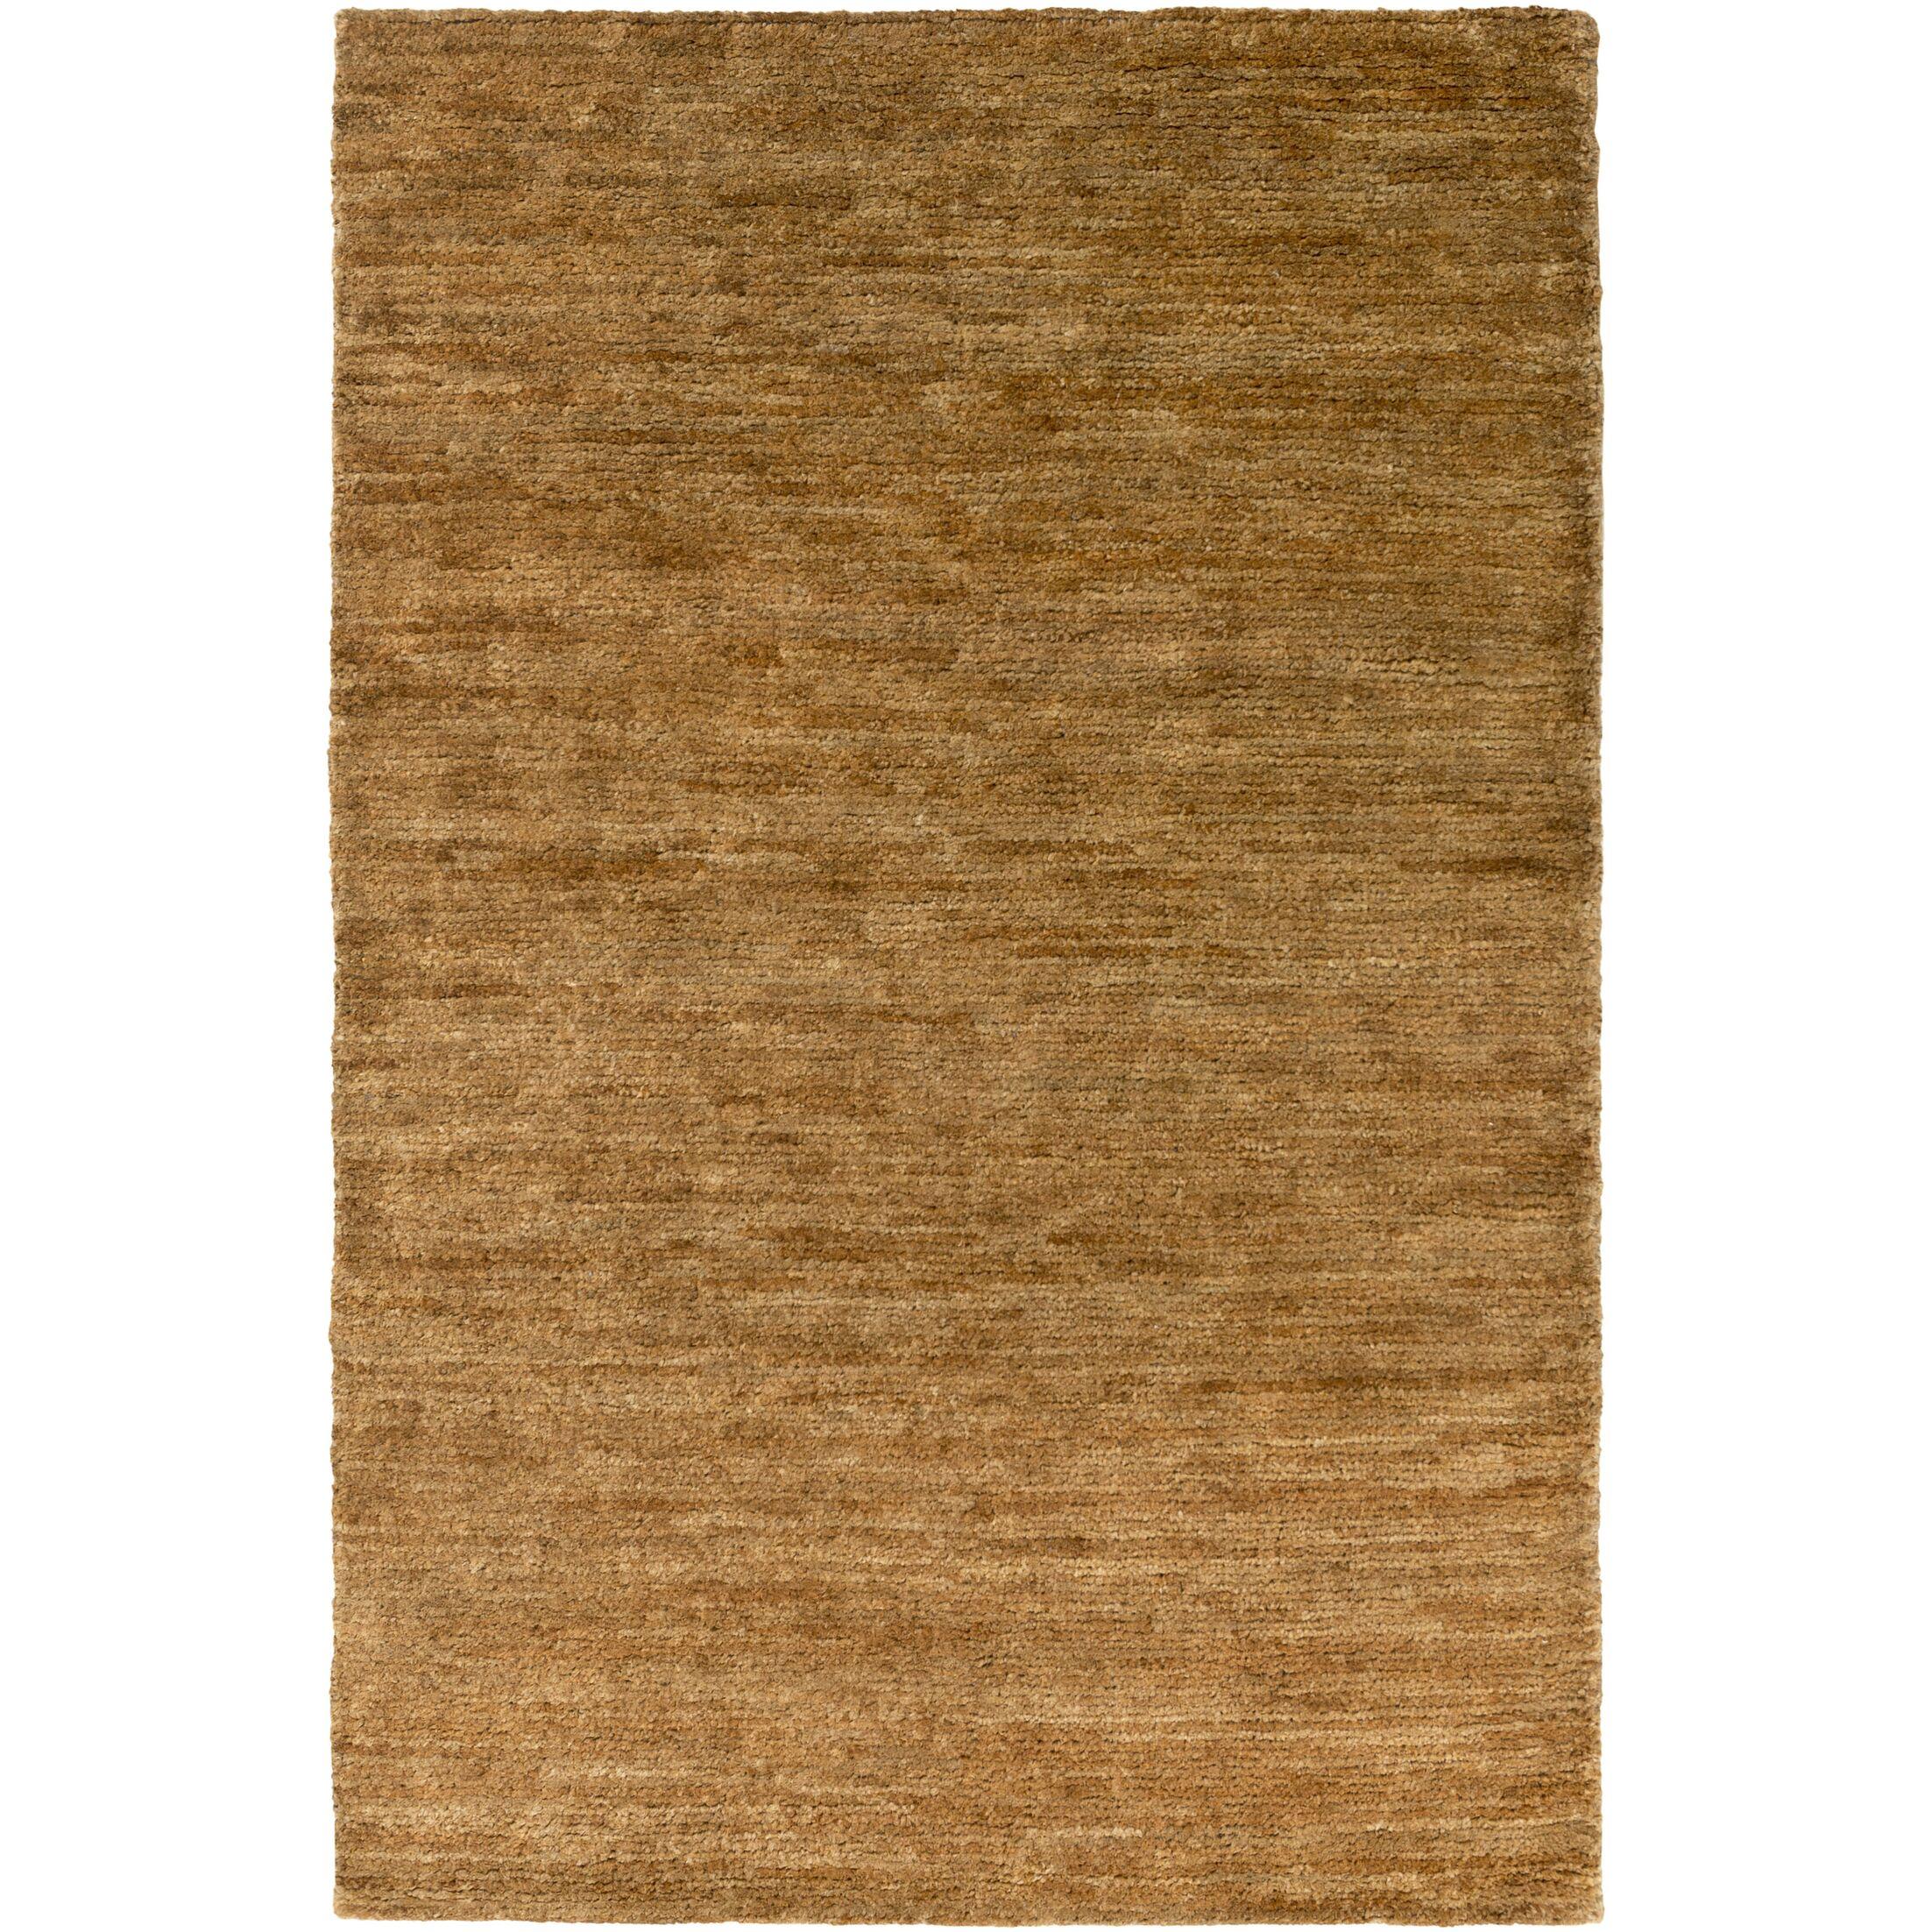 Henslee Brown Area Rug Rug Size: Rectangle 8' x 10'